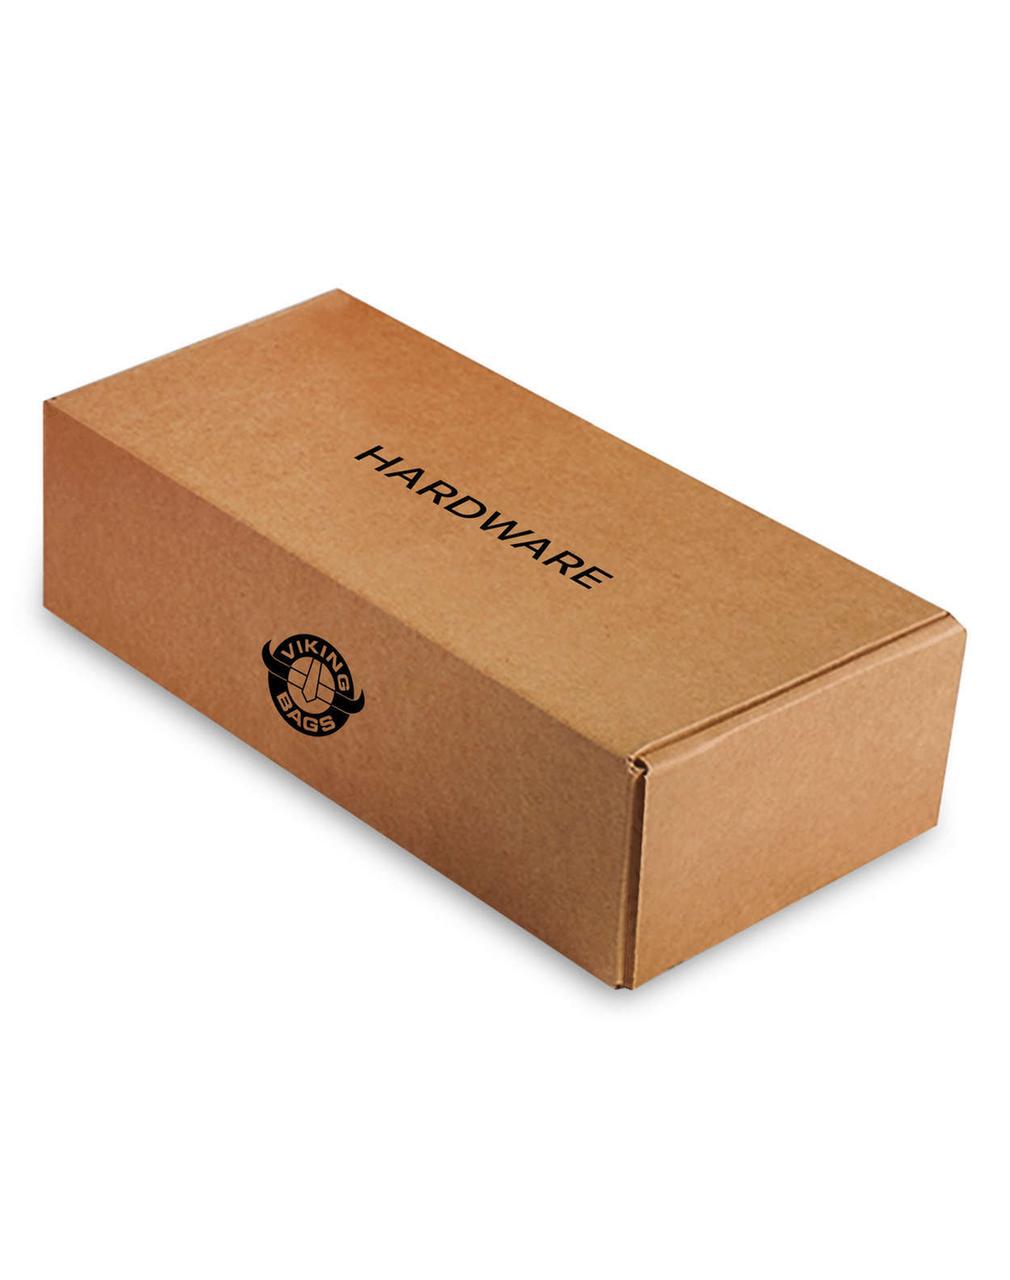 Honda 1100 Shadow Sabre Viking Raven Medium Leather Motorcycle Saddlebags Hardware Box